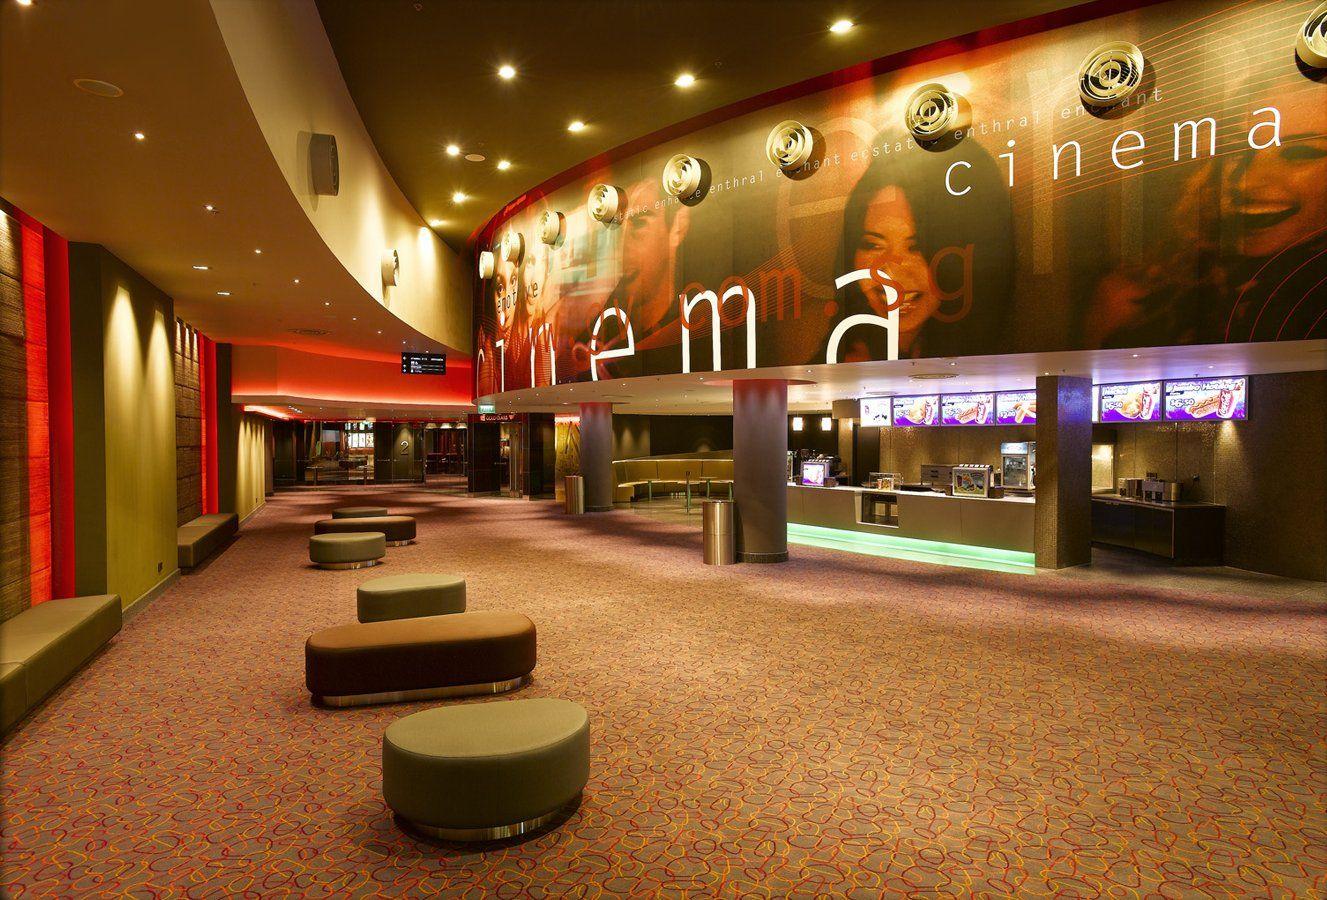 Home Theater Foyer : Village cinema vivo city singapore foyer entrance